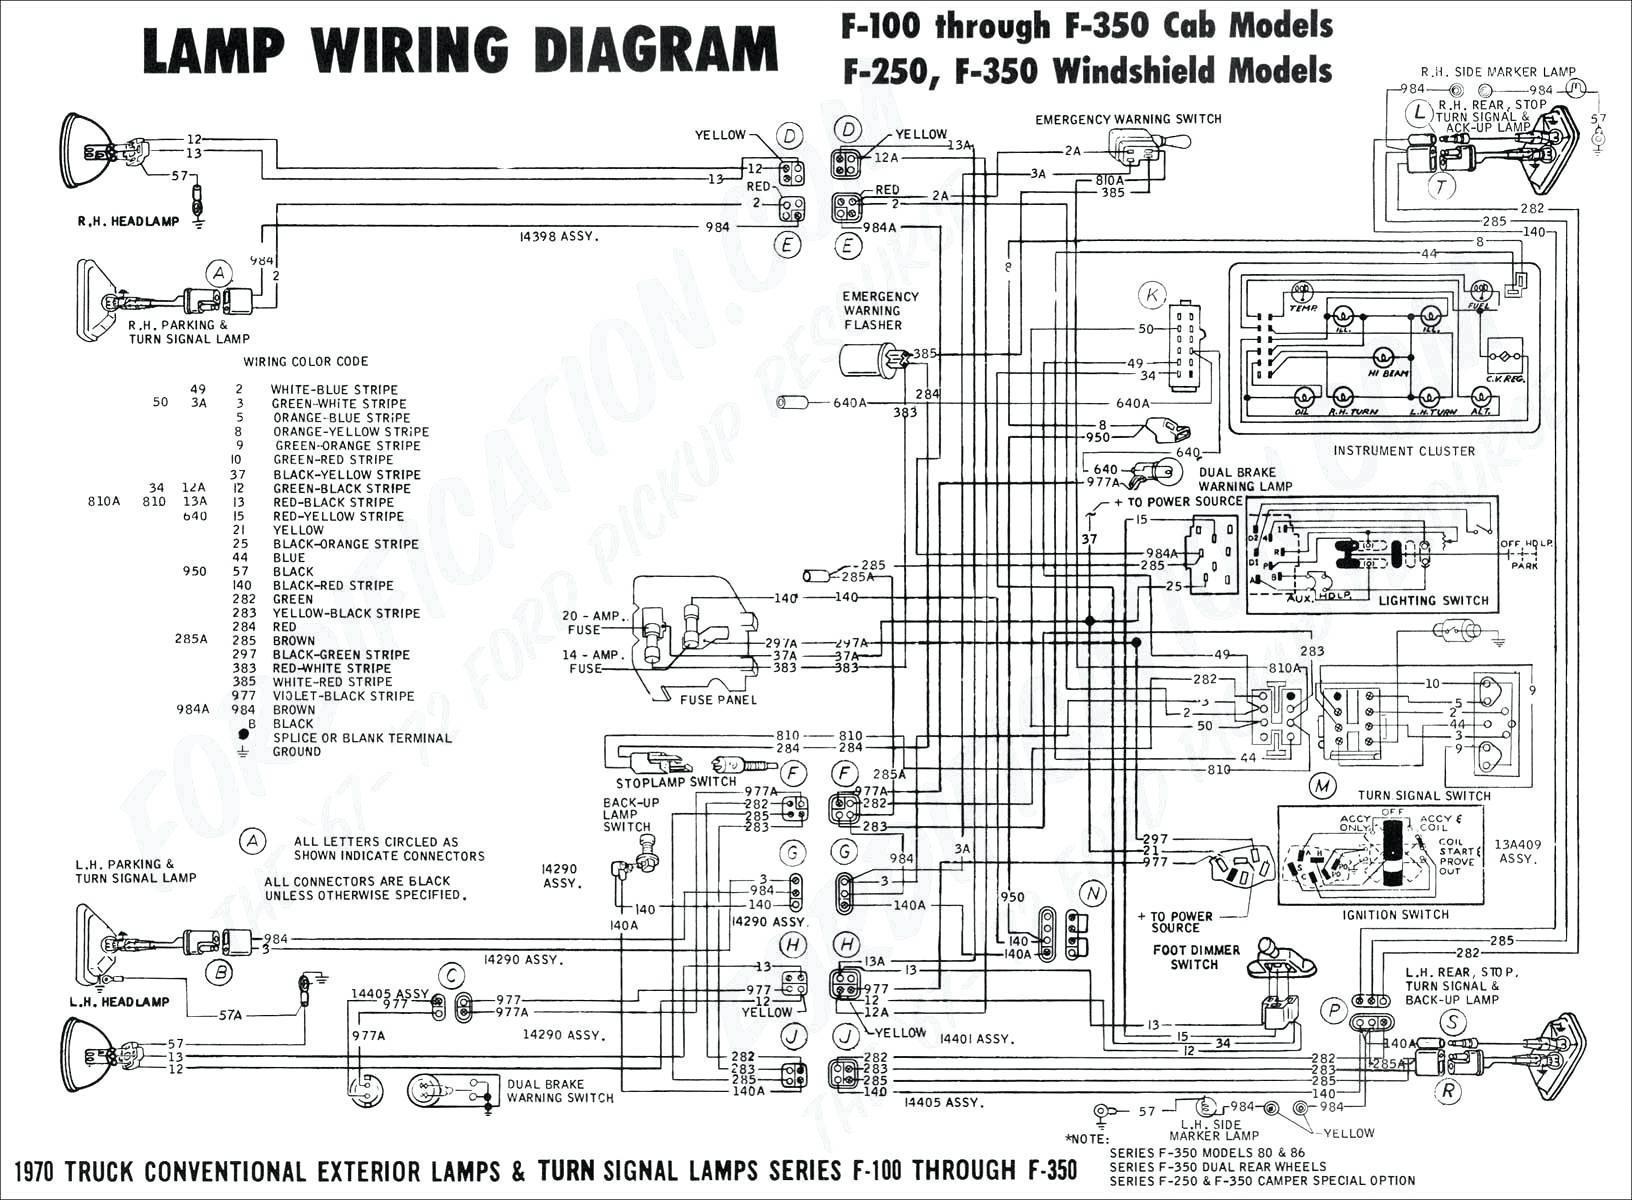 2008 Dodge Ram 1500 Trailer Wiring Diagram New 2008 Dodge Ram 1500 Trailer  Brake Wiring Diagram